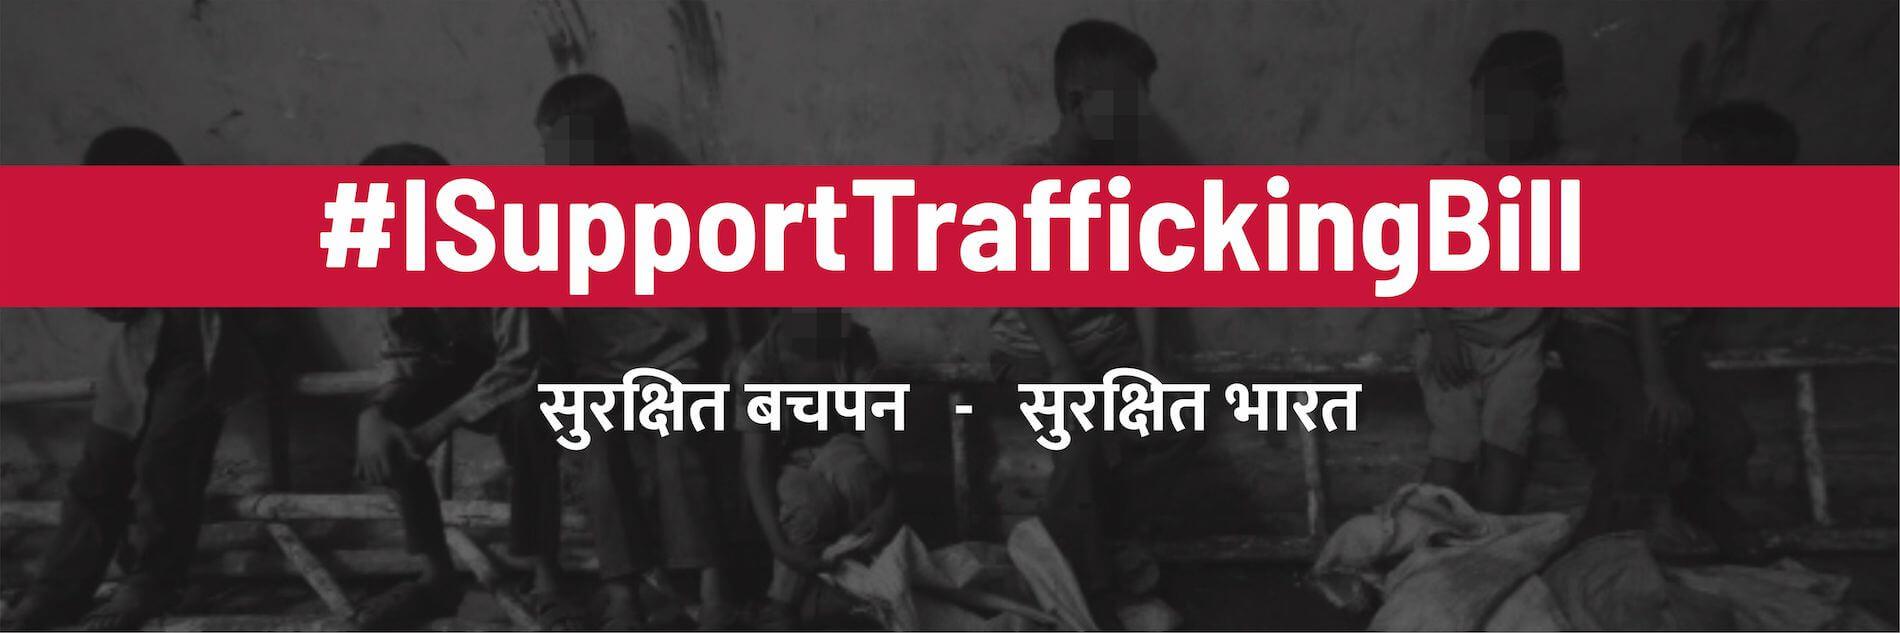 Kailash Satyarthi Children foundation support trafficking bill